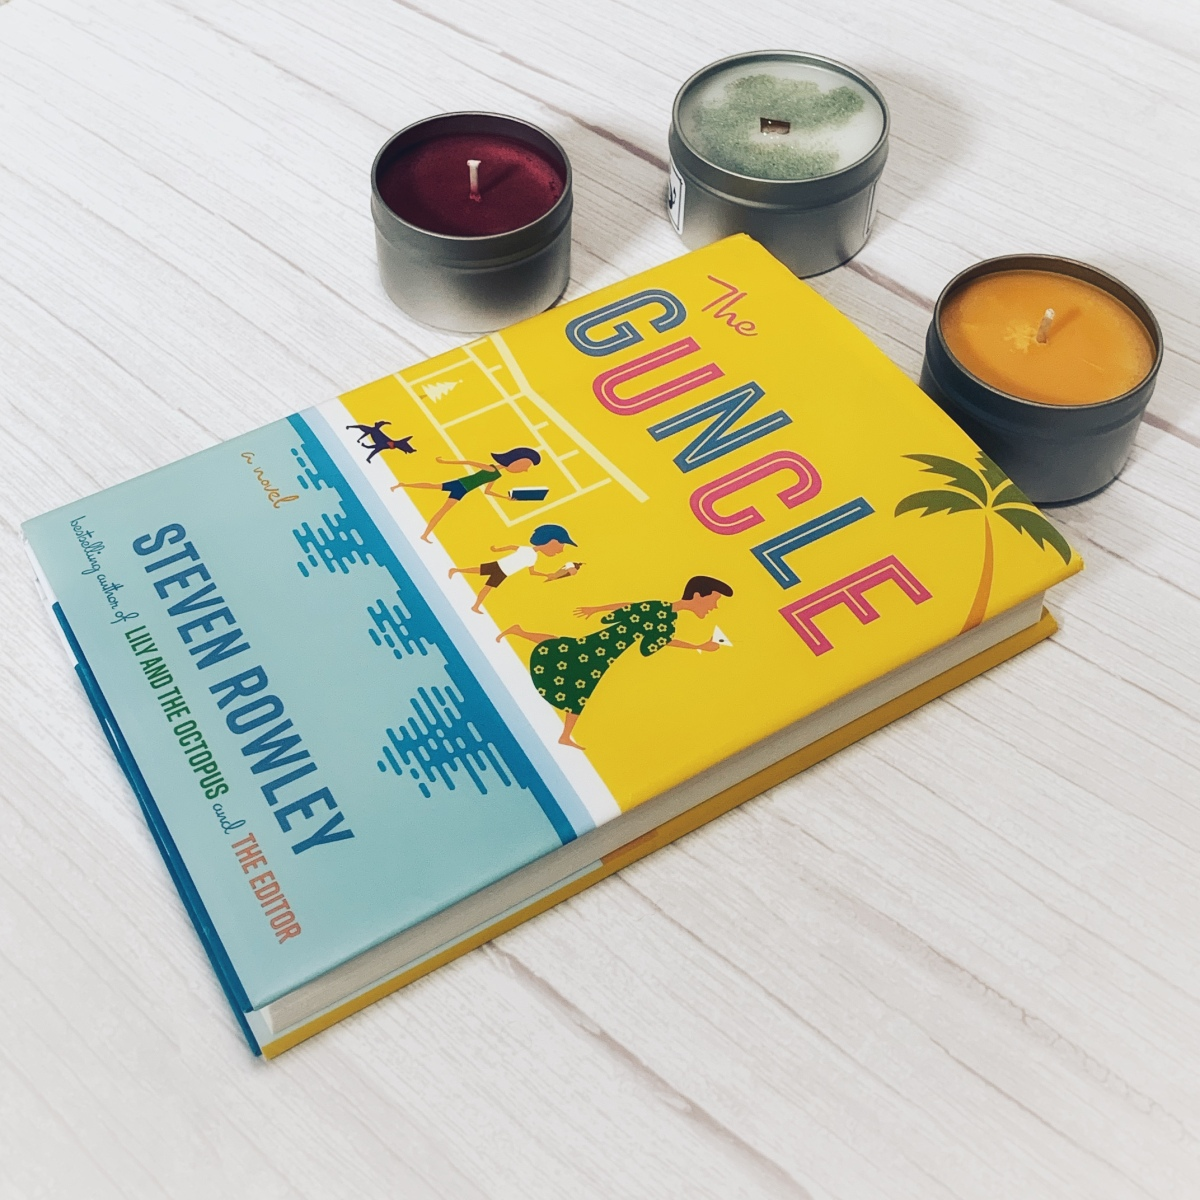 Loving GUP: A BeautifulBook